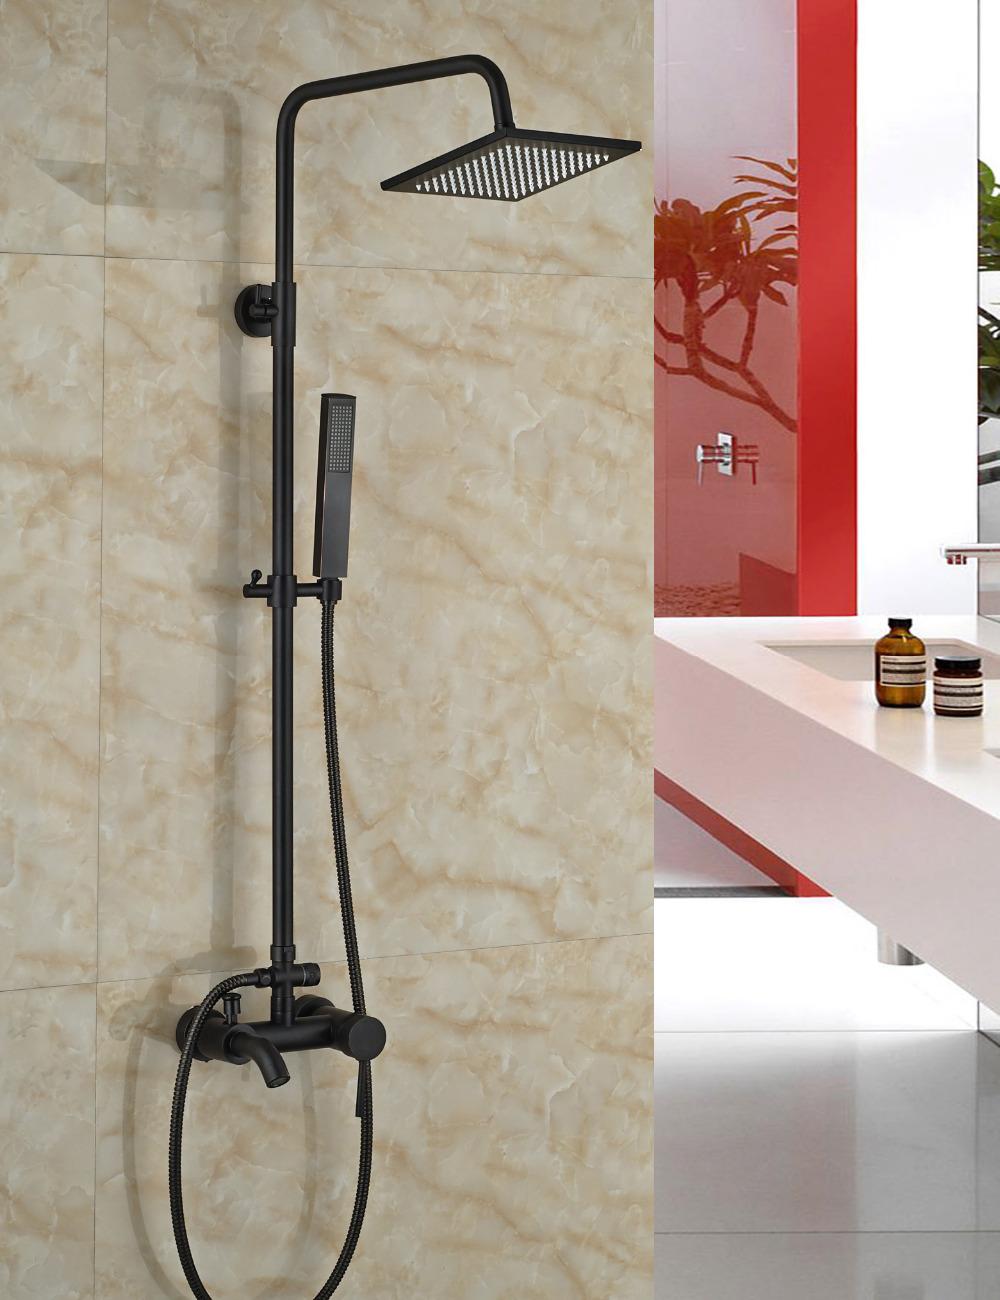 Fontana Renalto Single Handle LED Square Shower Head Wall Mount Shower Set Oil Rubbed Bronze W/ Hand Shower